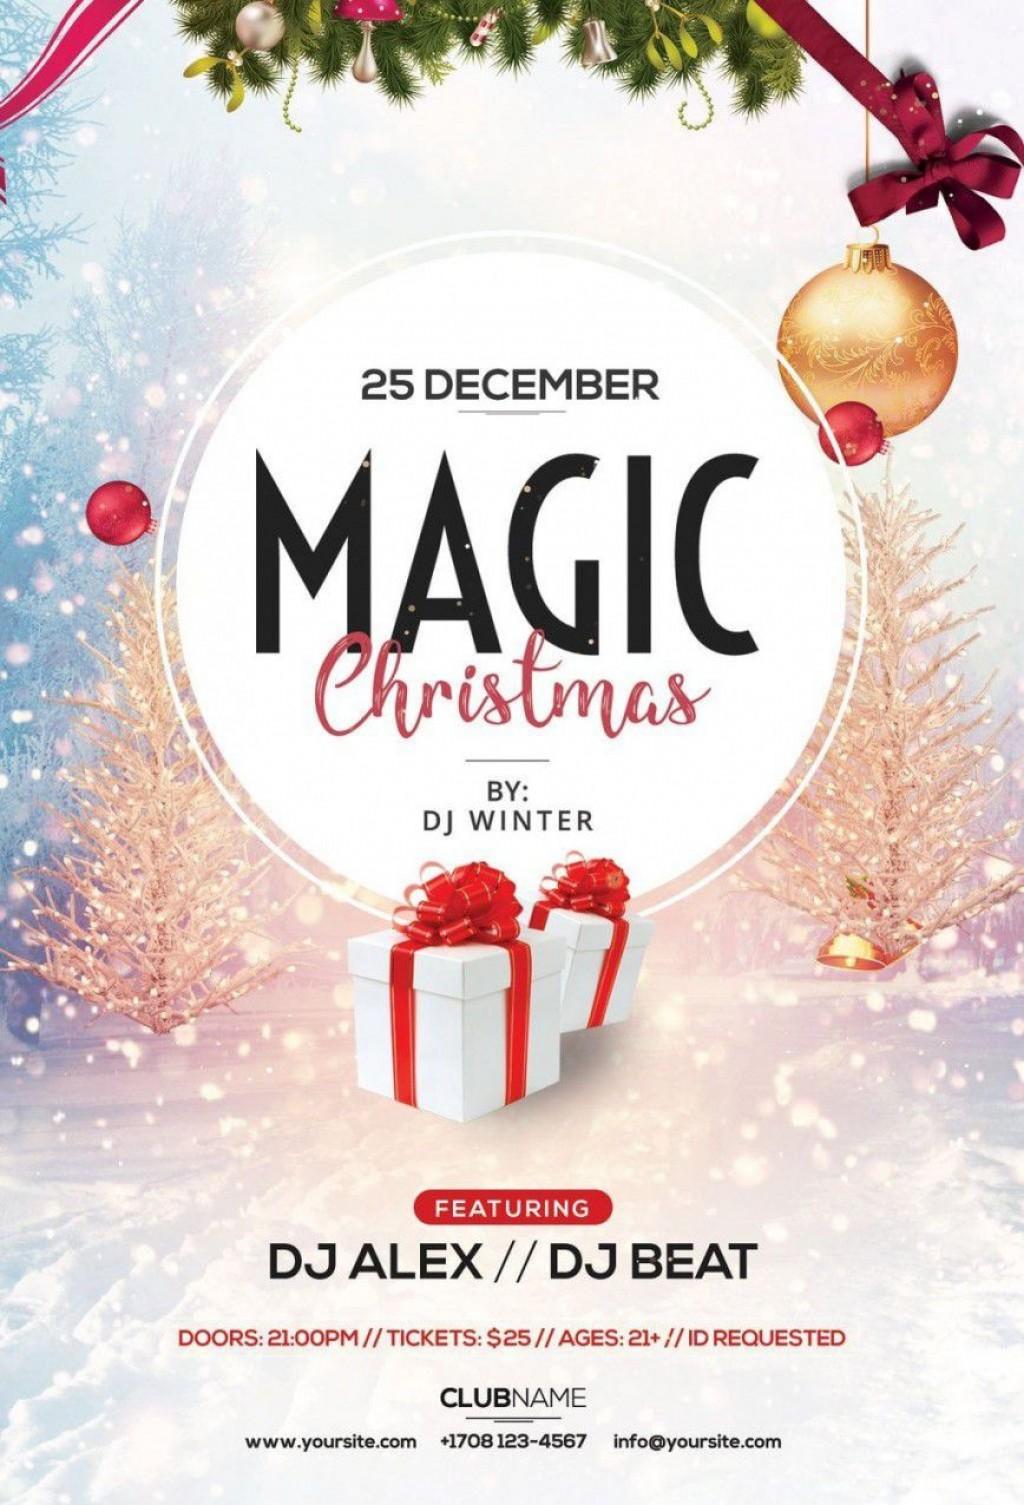 000 Astounding Free Christma Flyer Template Inspiration  Templates Holiday Invitation Microsoft Word PsdLarge